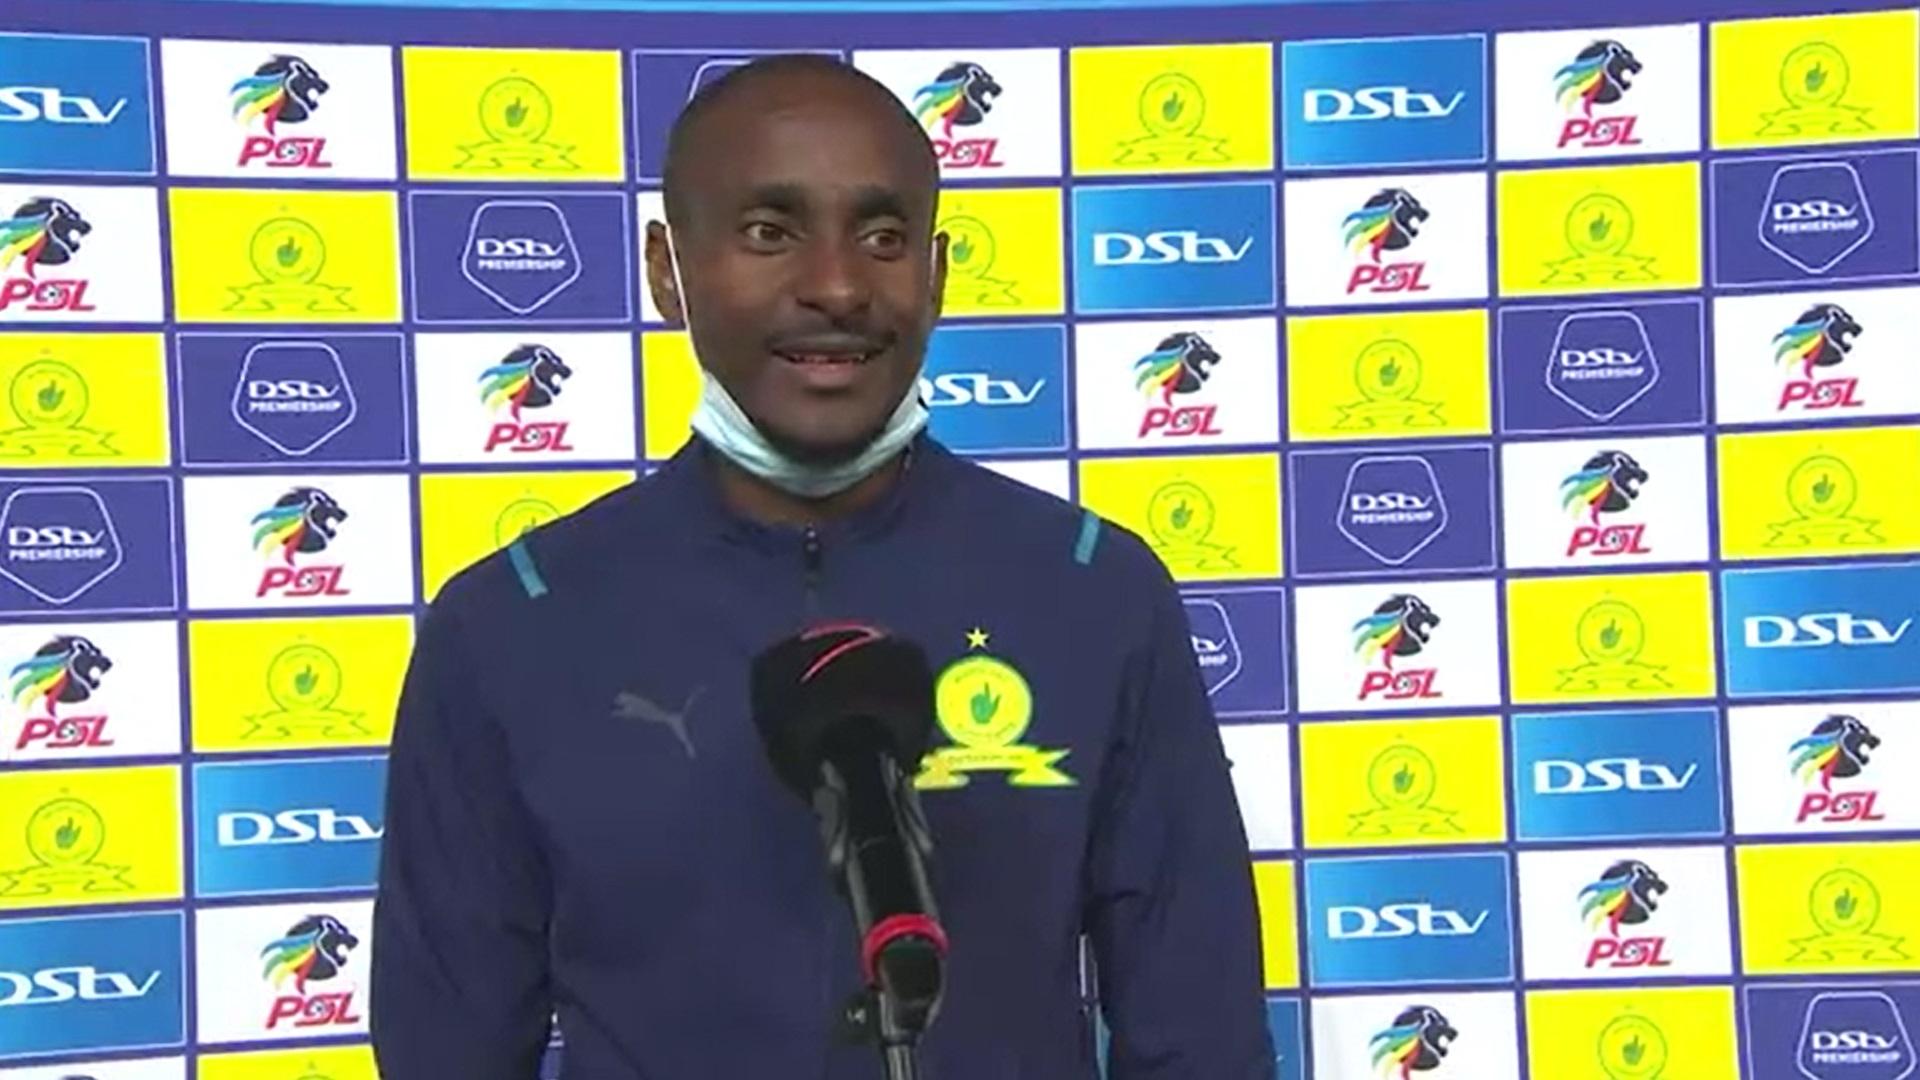 DStv Premiership | Mamelodi Sundowns v Kaizer Chiefs | Post-match interview with Rhulani Mokwena